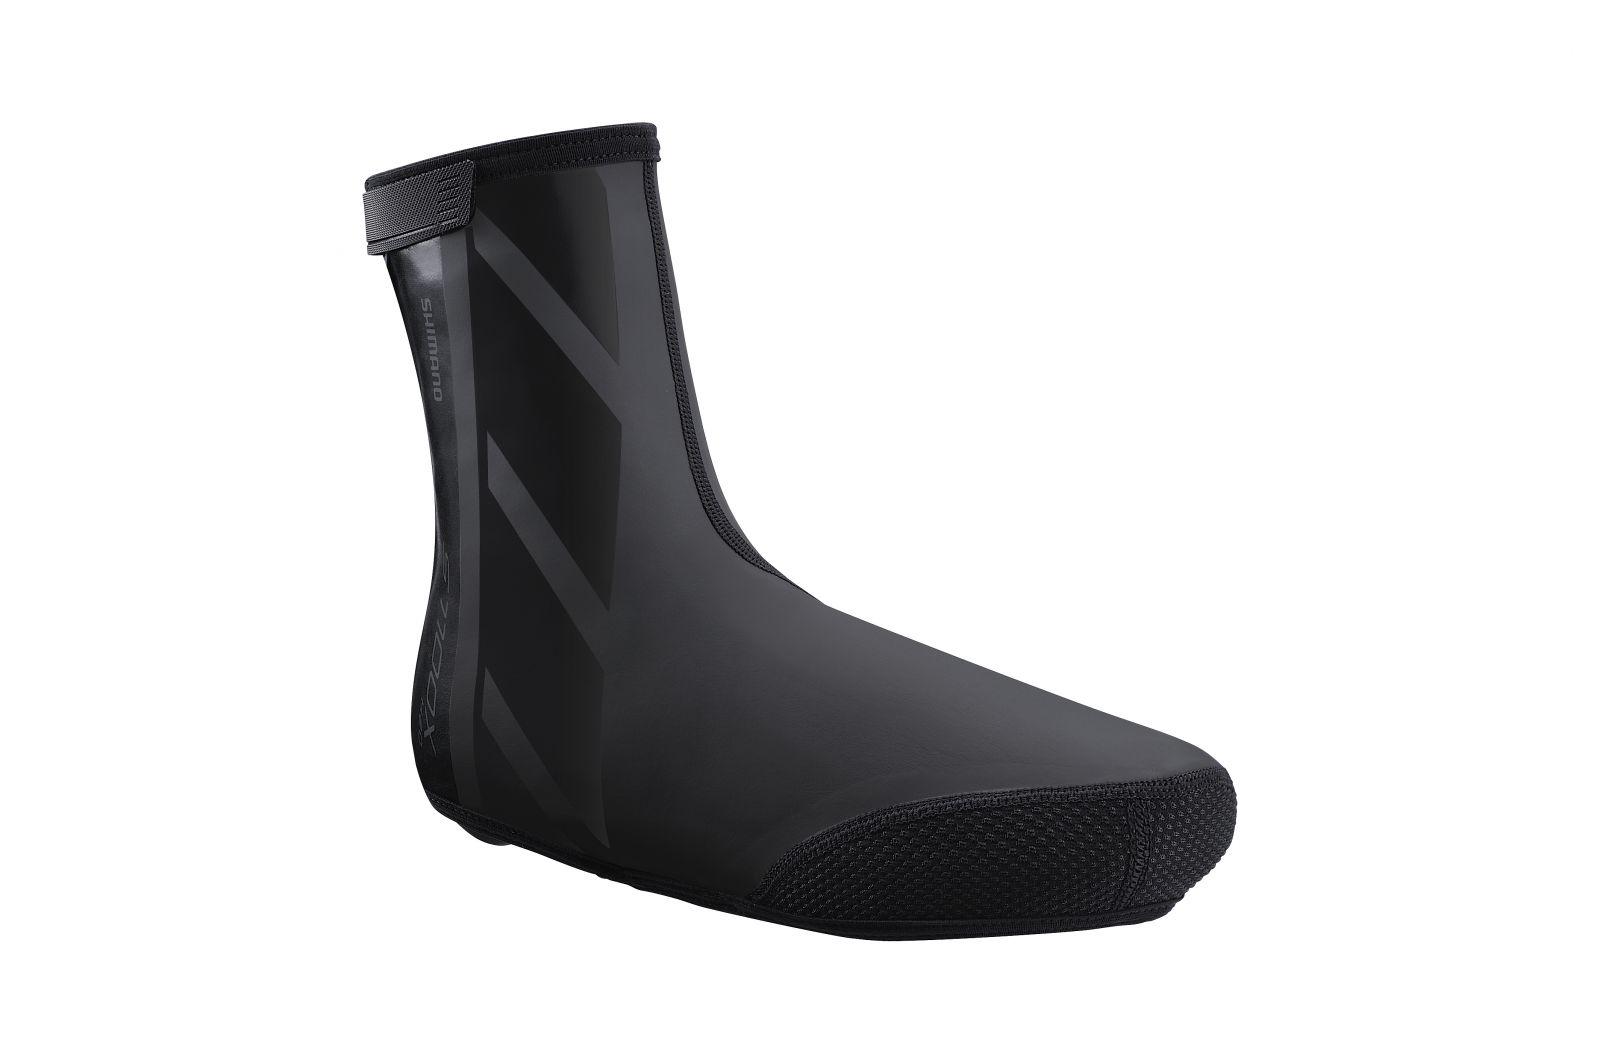 SHIMANO S1100X H2O návleky na obuv, černá, XL